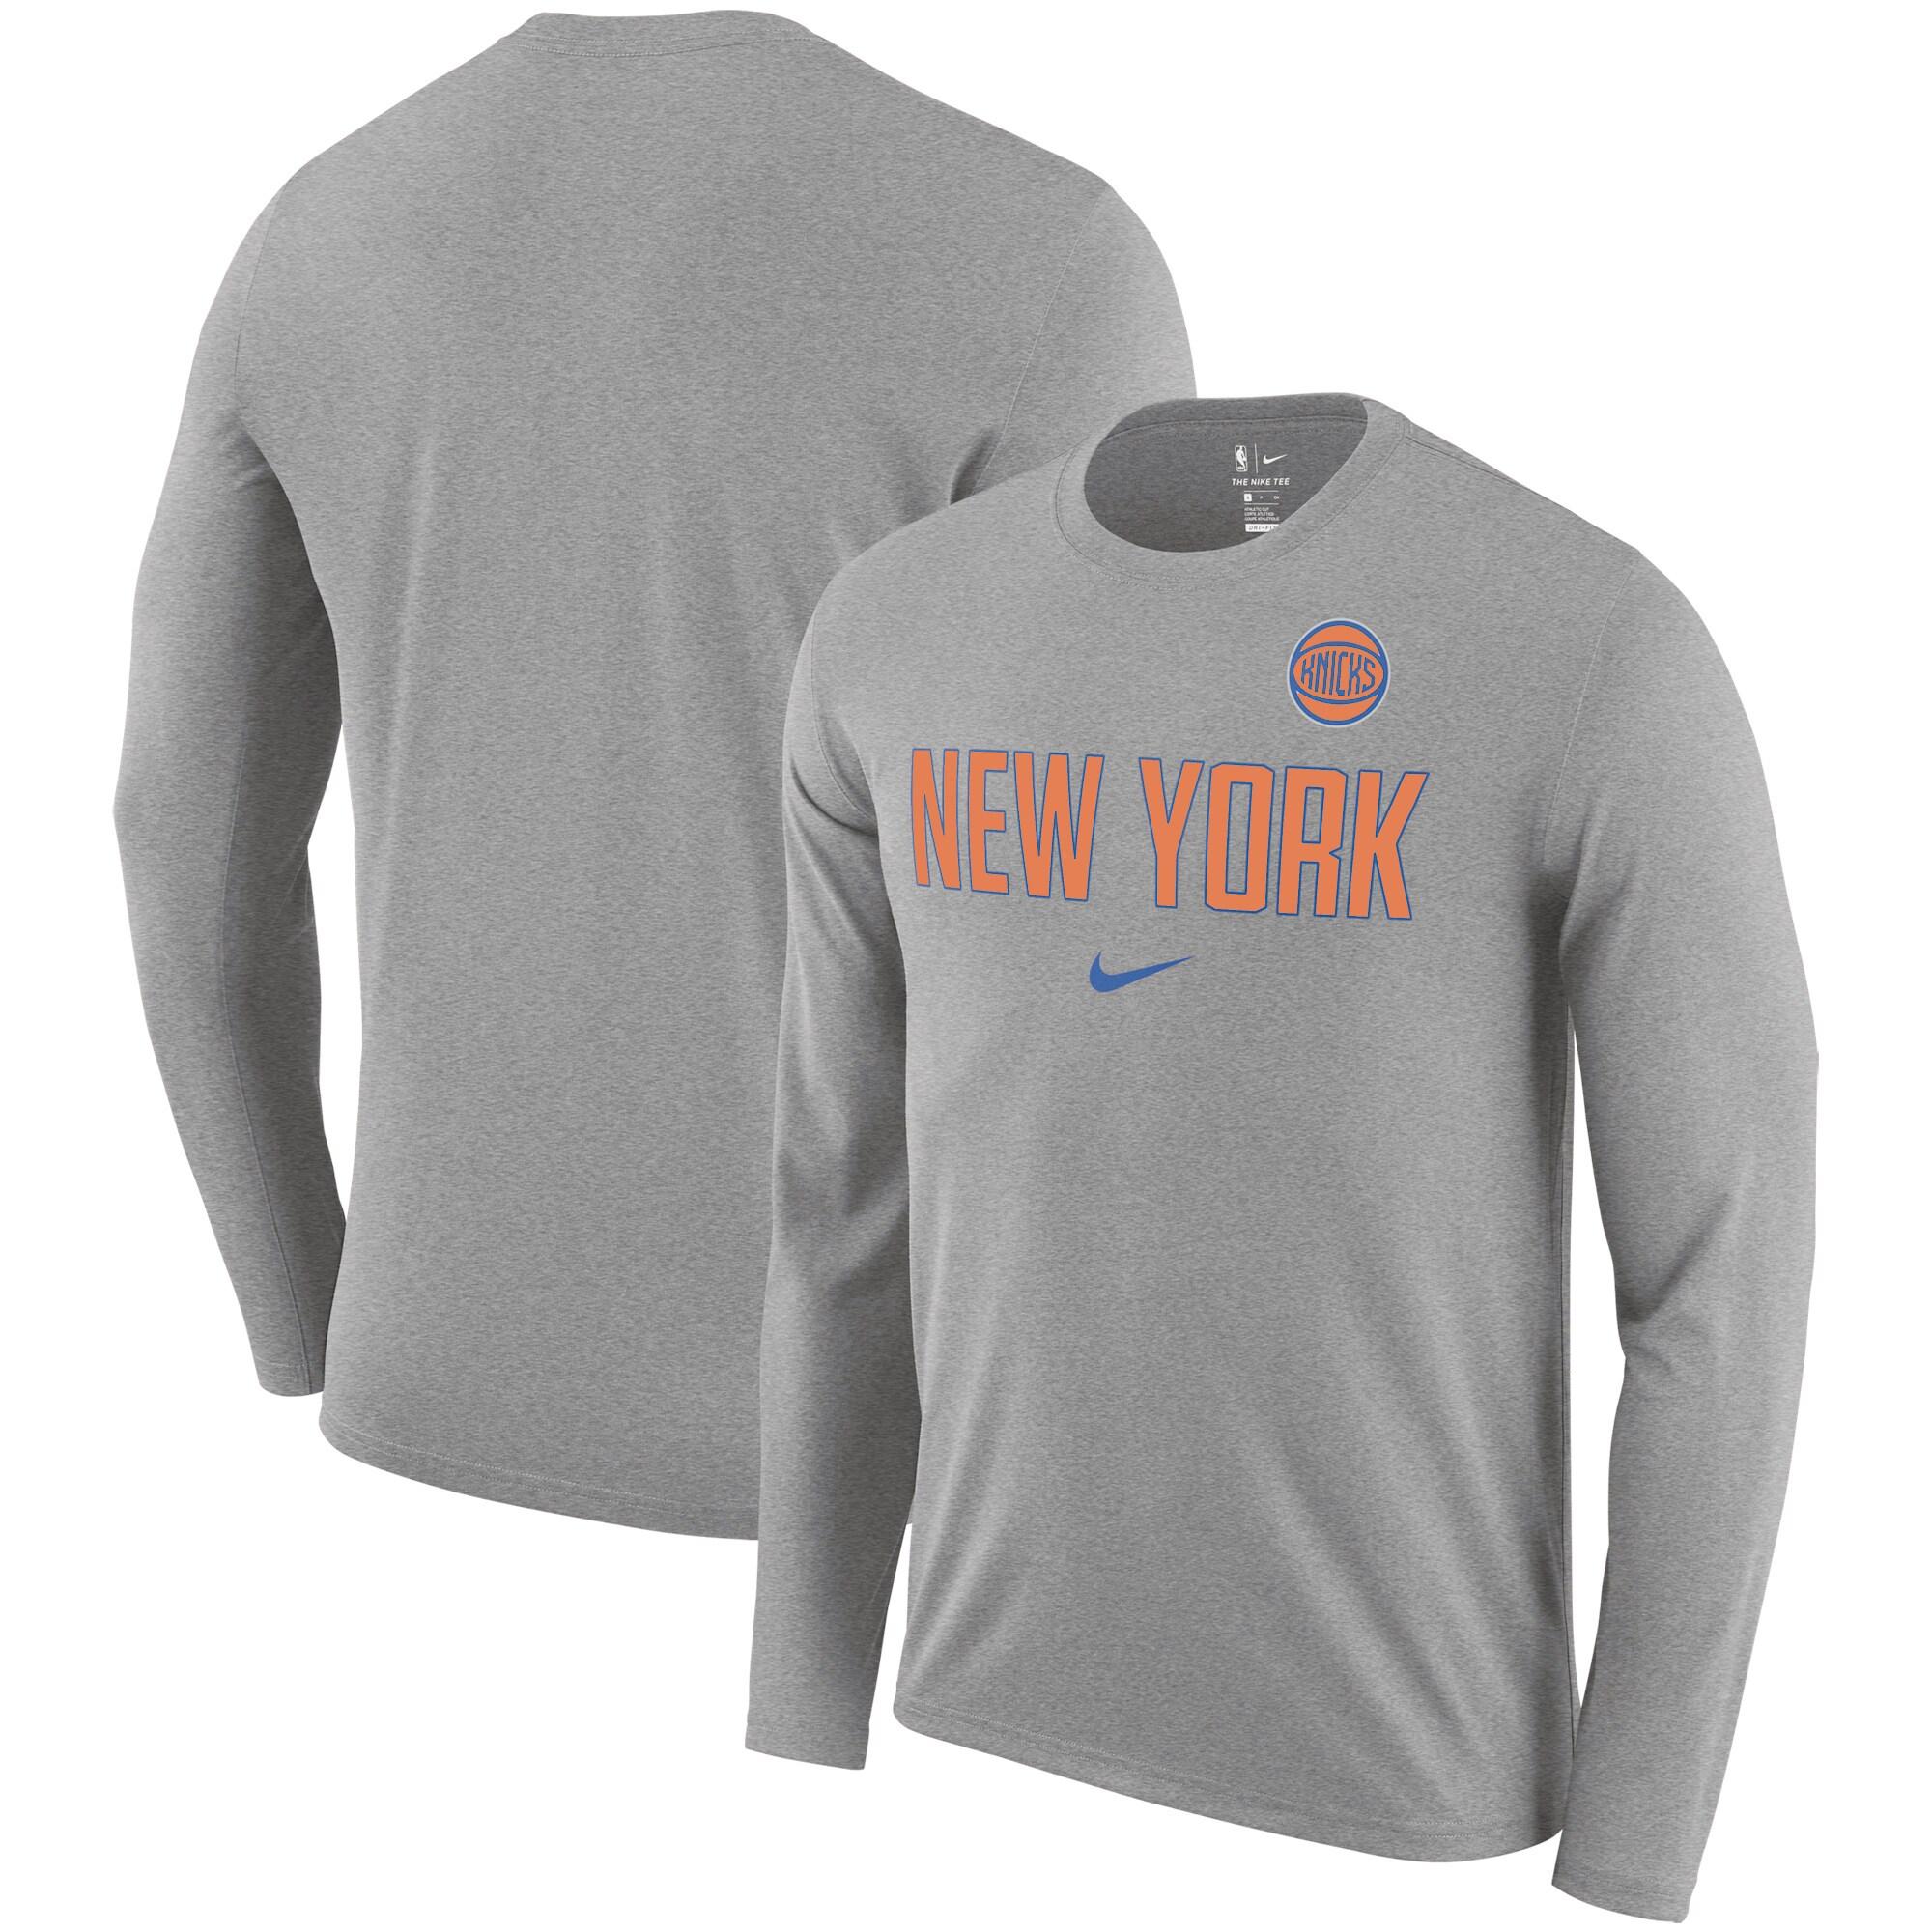 New York Knicks Nike Essential Facility Slub Performance Long Sleeve T-Shirt - Heathered Charcoal